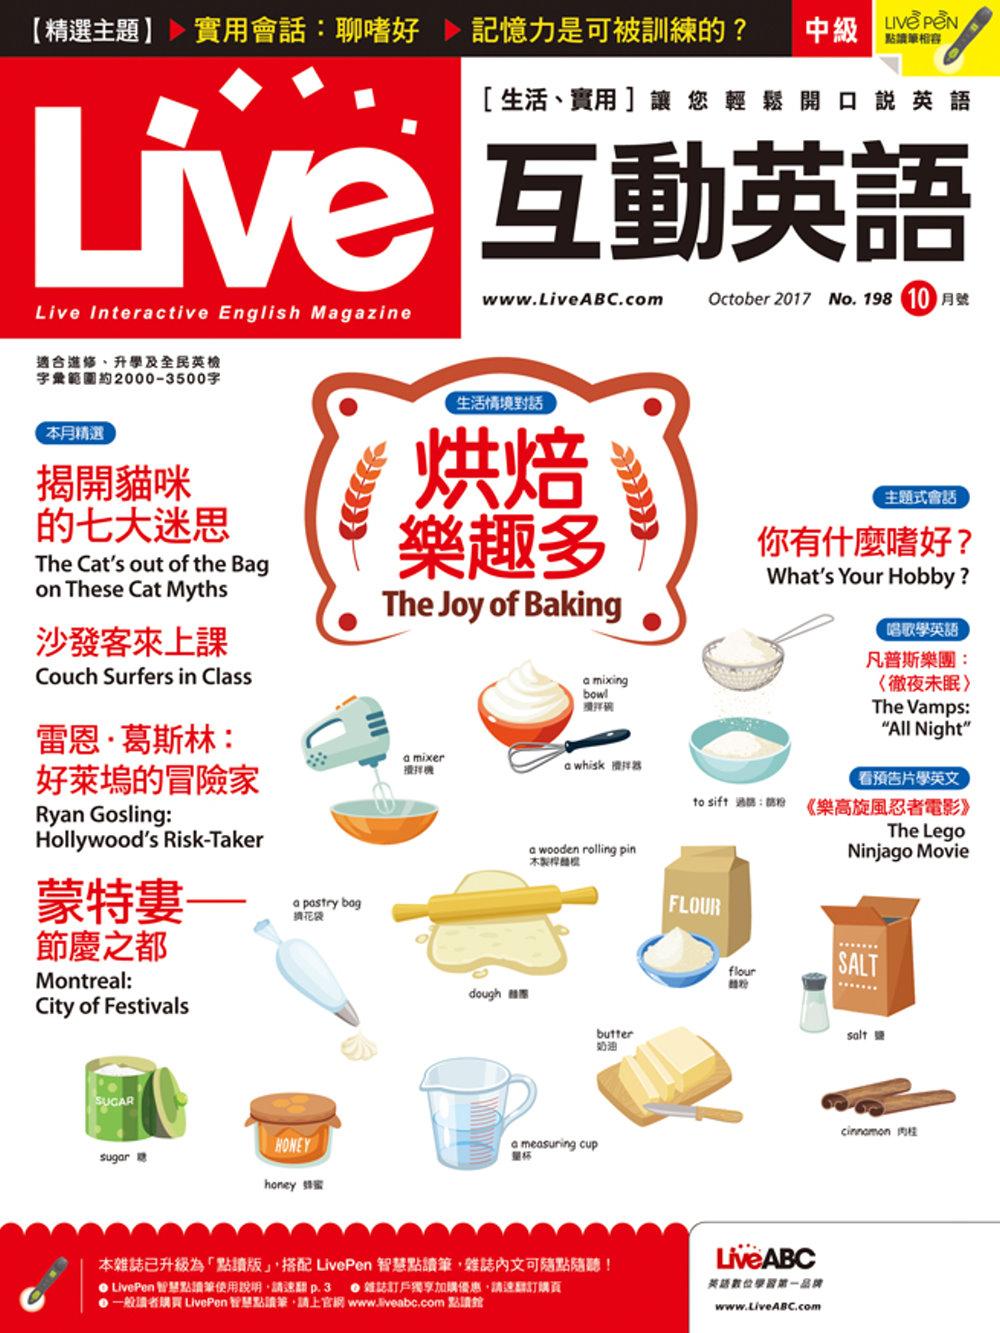 Live互動英語(課文朗讀版)一年12期 +頂尖廚師TOP CHEF304不鏽鋼多功能萬用鍋